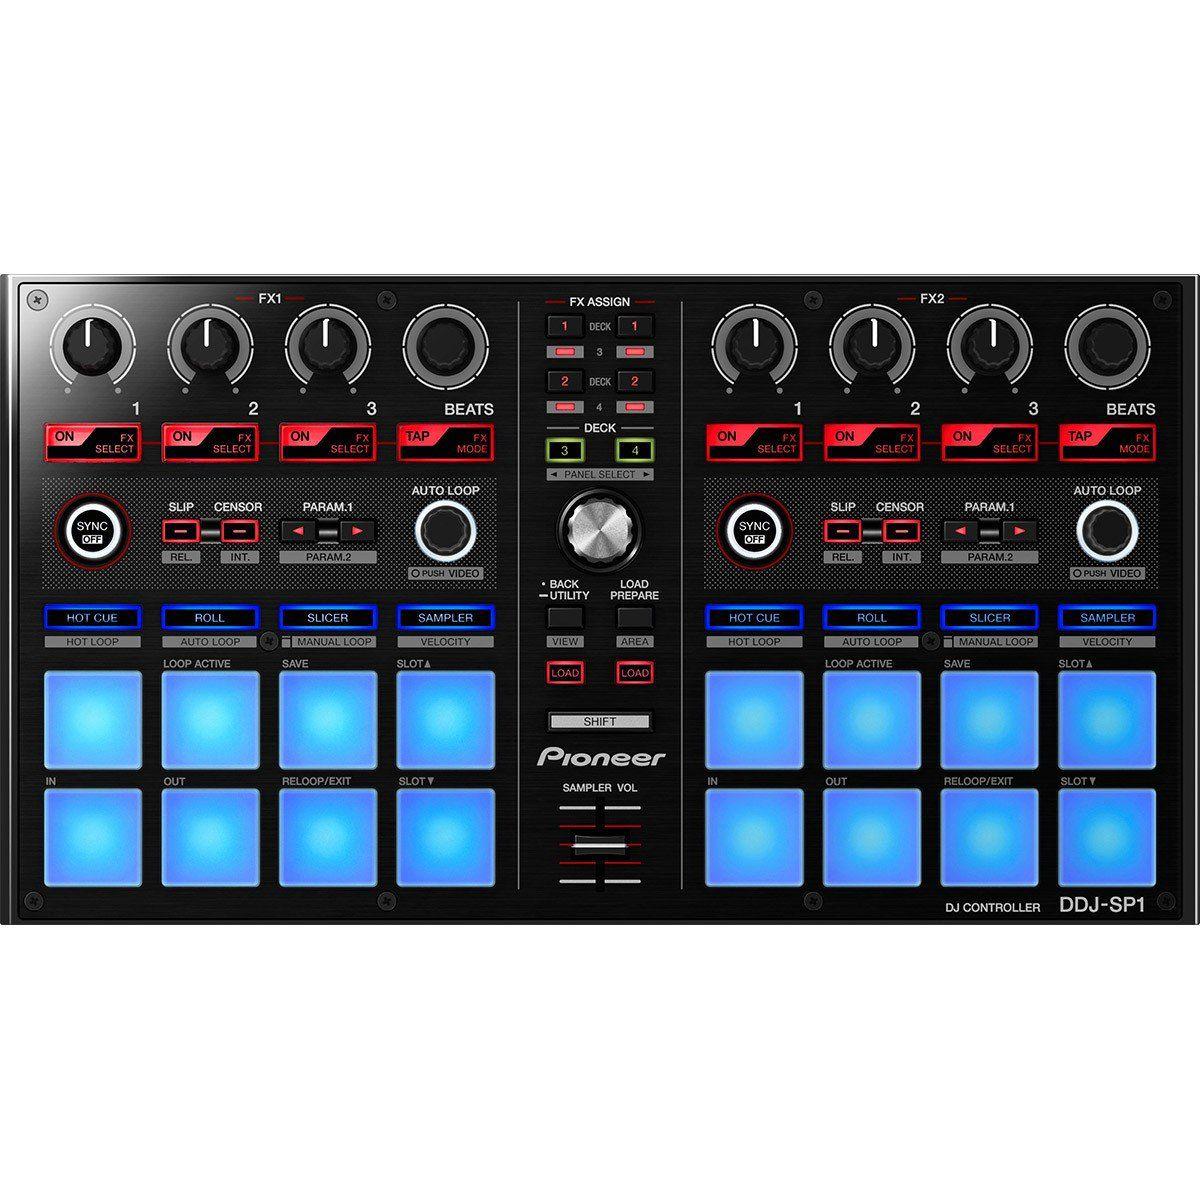 Pioneer DDJ-SP1 Controladora DJ DDJ SP1 4-Canais 2-Decks 16 Pads Serato 3 Knobs